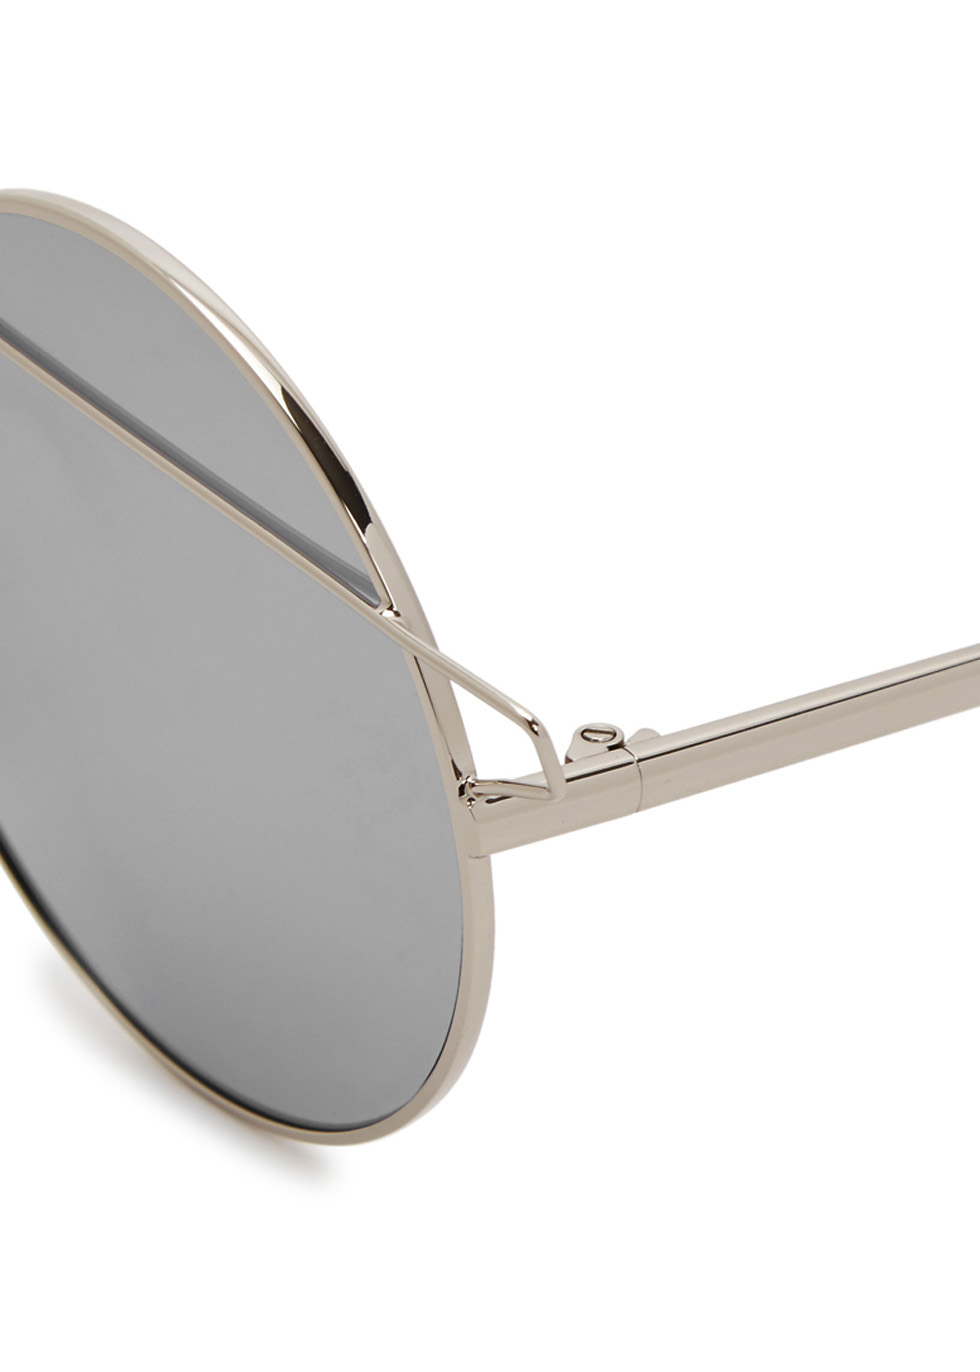 Mykonos silver tone round-frame sunglasses - FOR ART'S SAKE